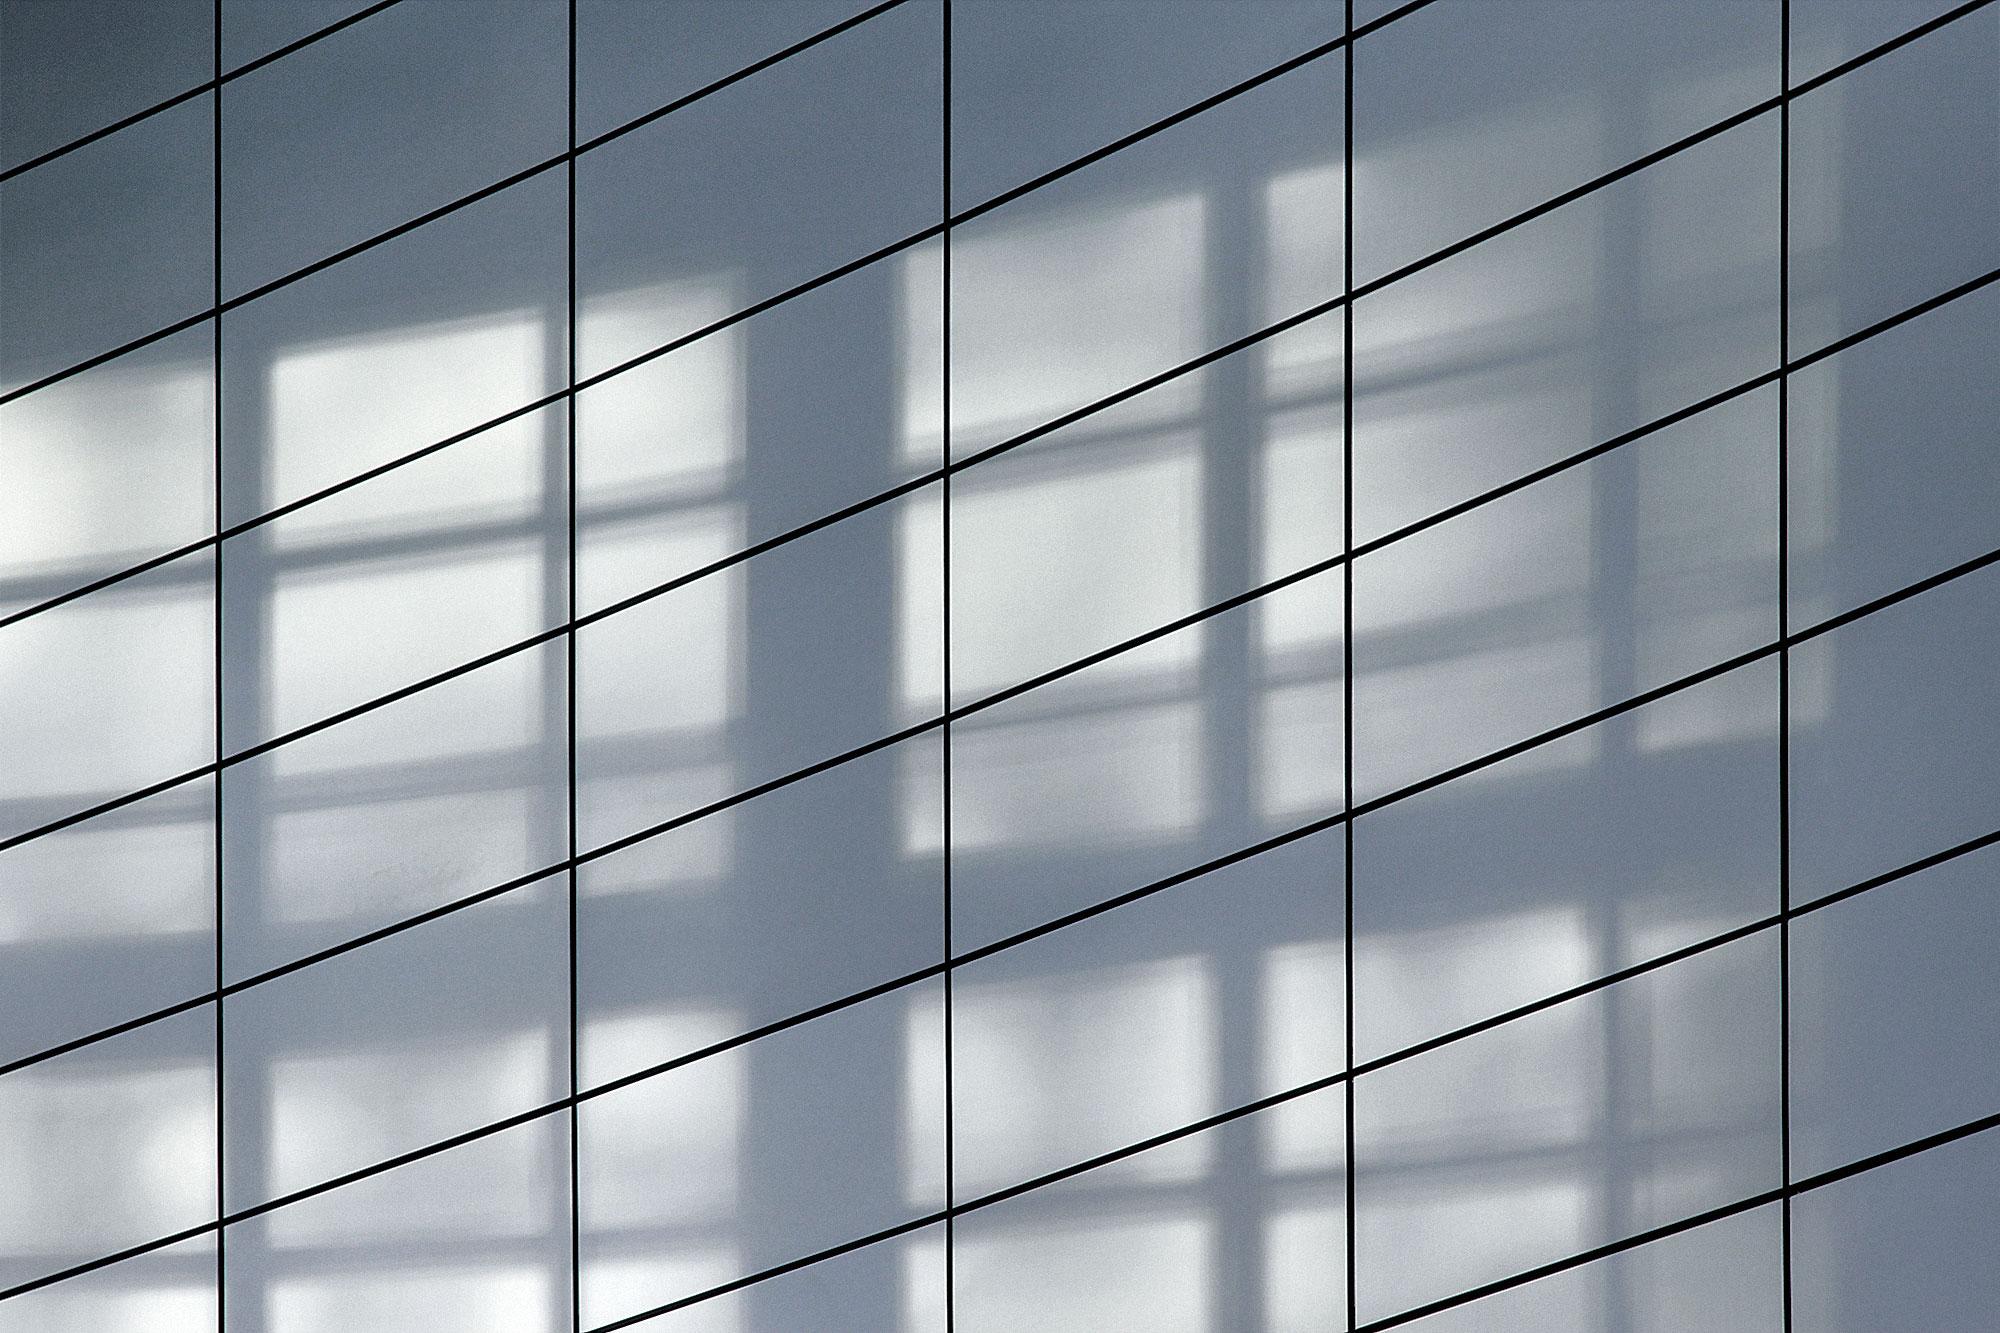 Pollux, Frankfurt am Main (architect: Kohn, Pederson, Fox)